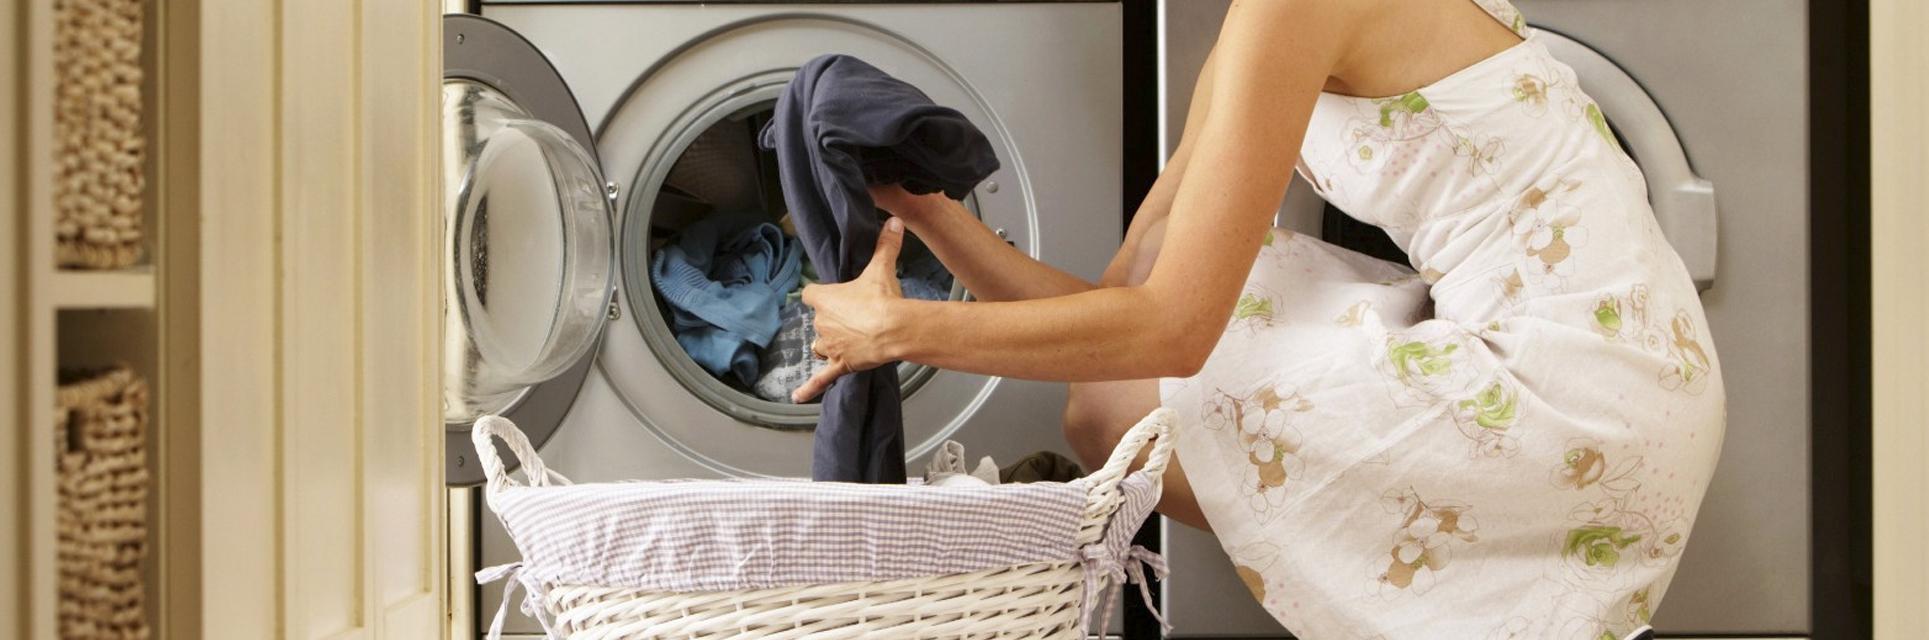 Servicio tecnico lavadoras junkers mundoclima for Servicio tecnico oficial junkers